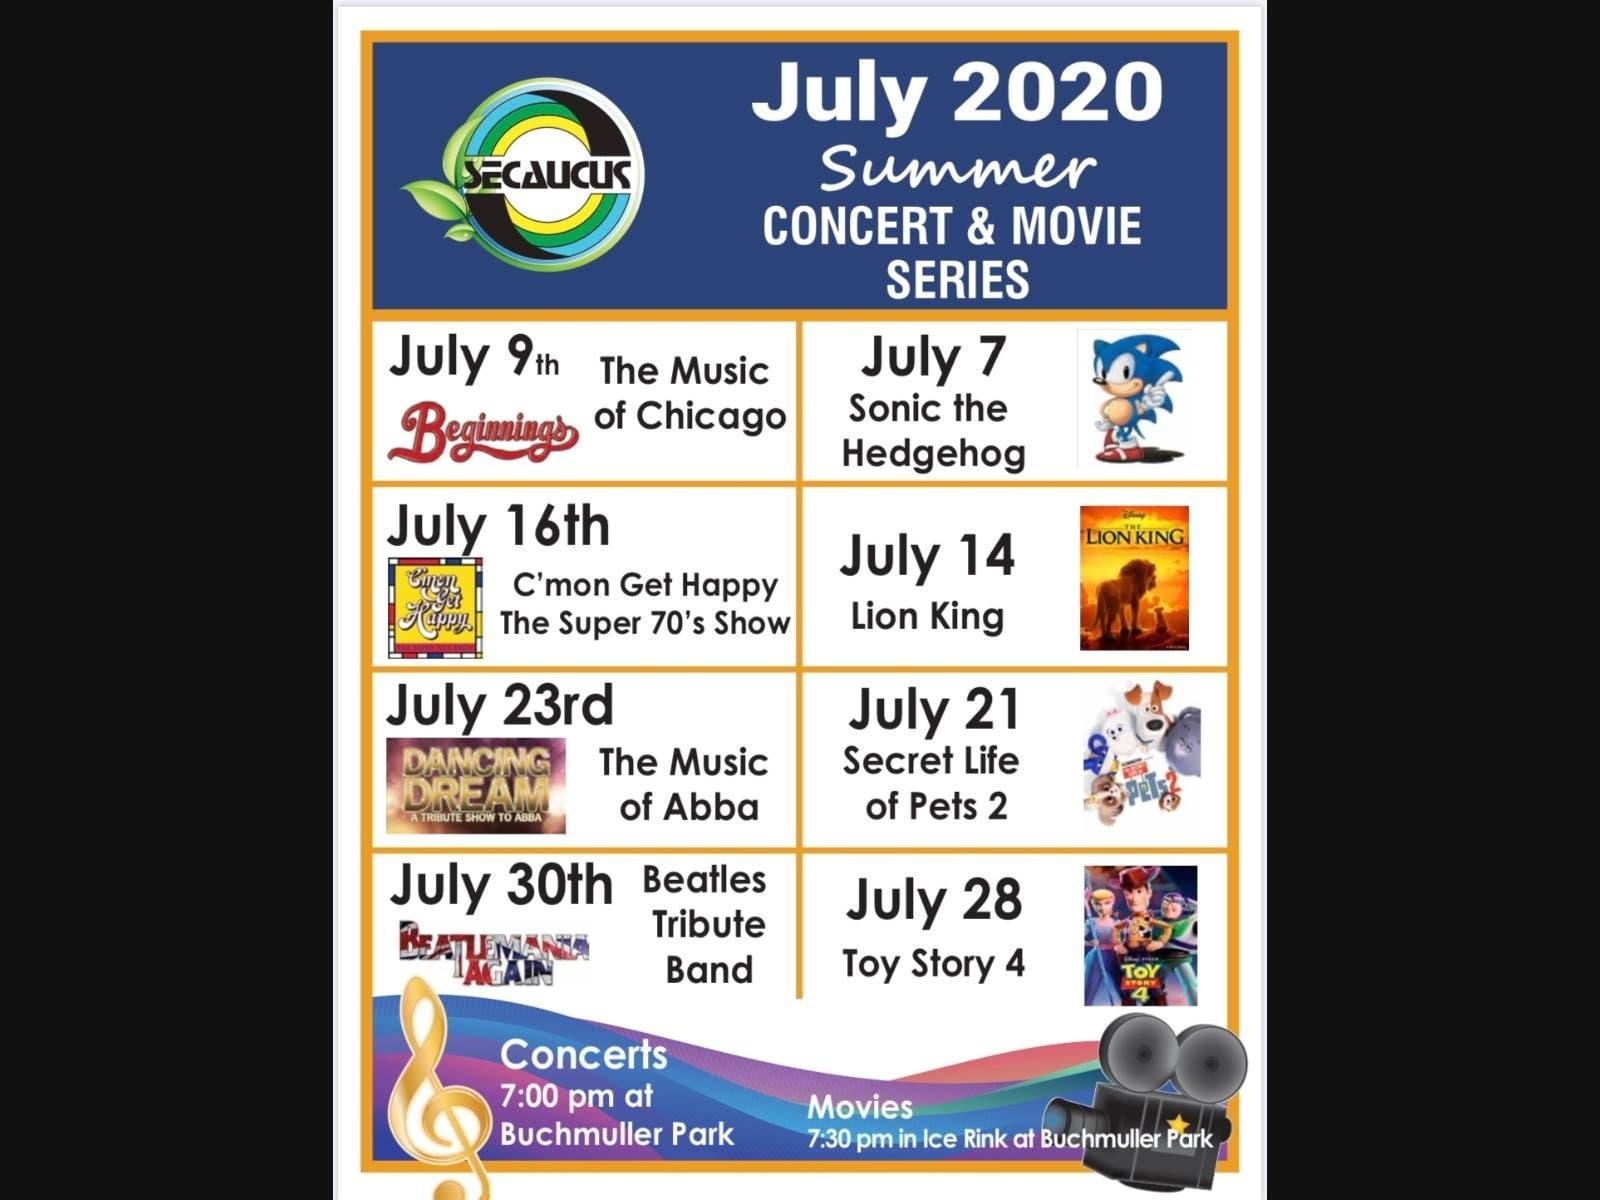 Schedule Of Secaucus' Free Outdoor Movies, Concerts